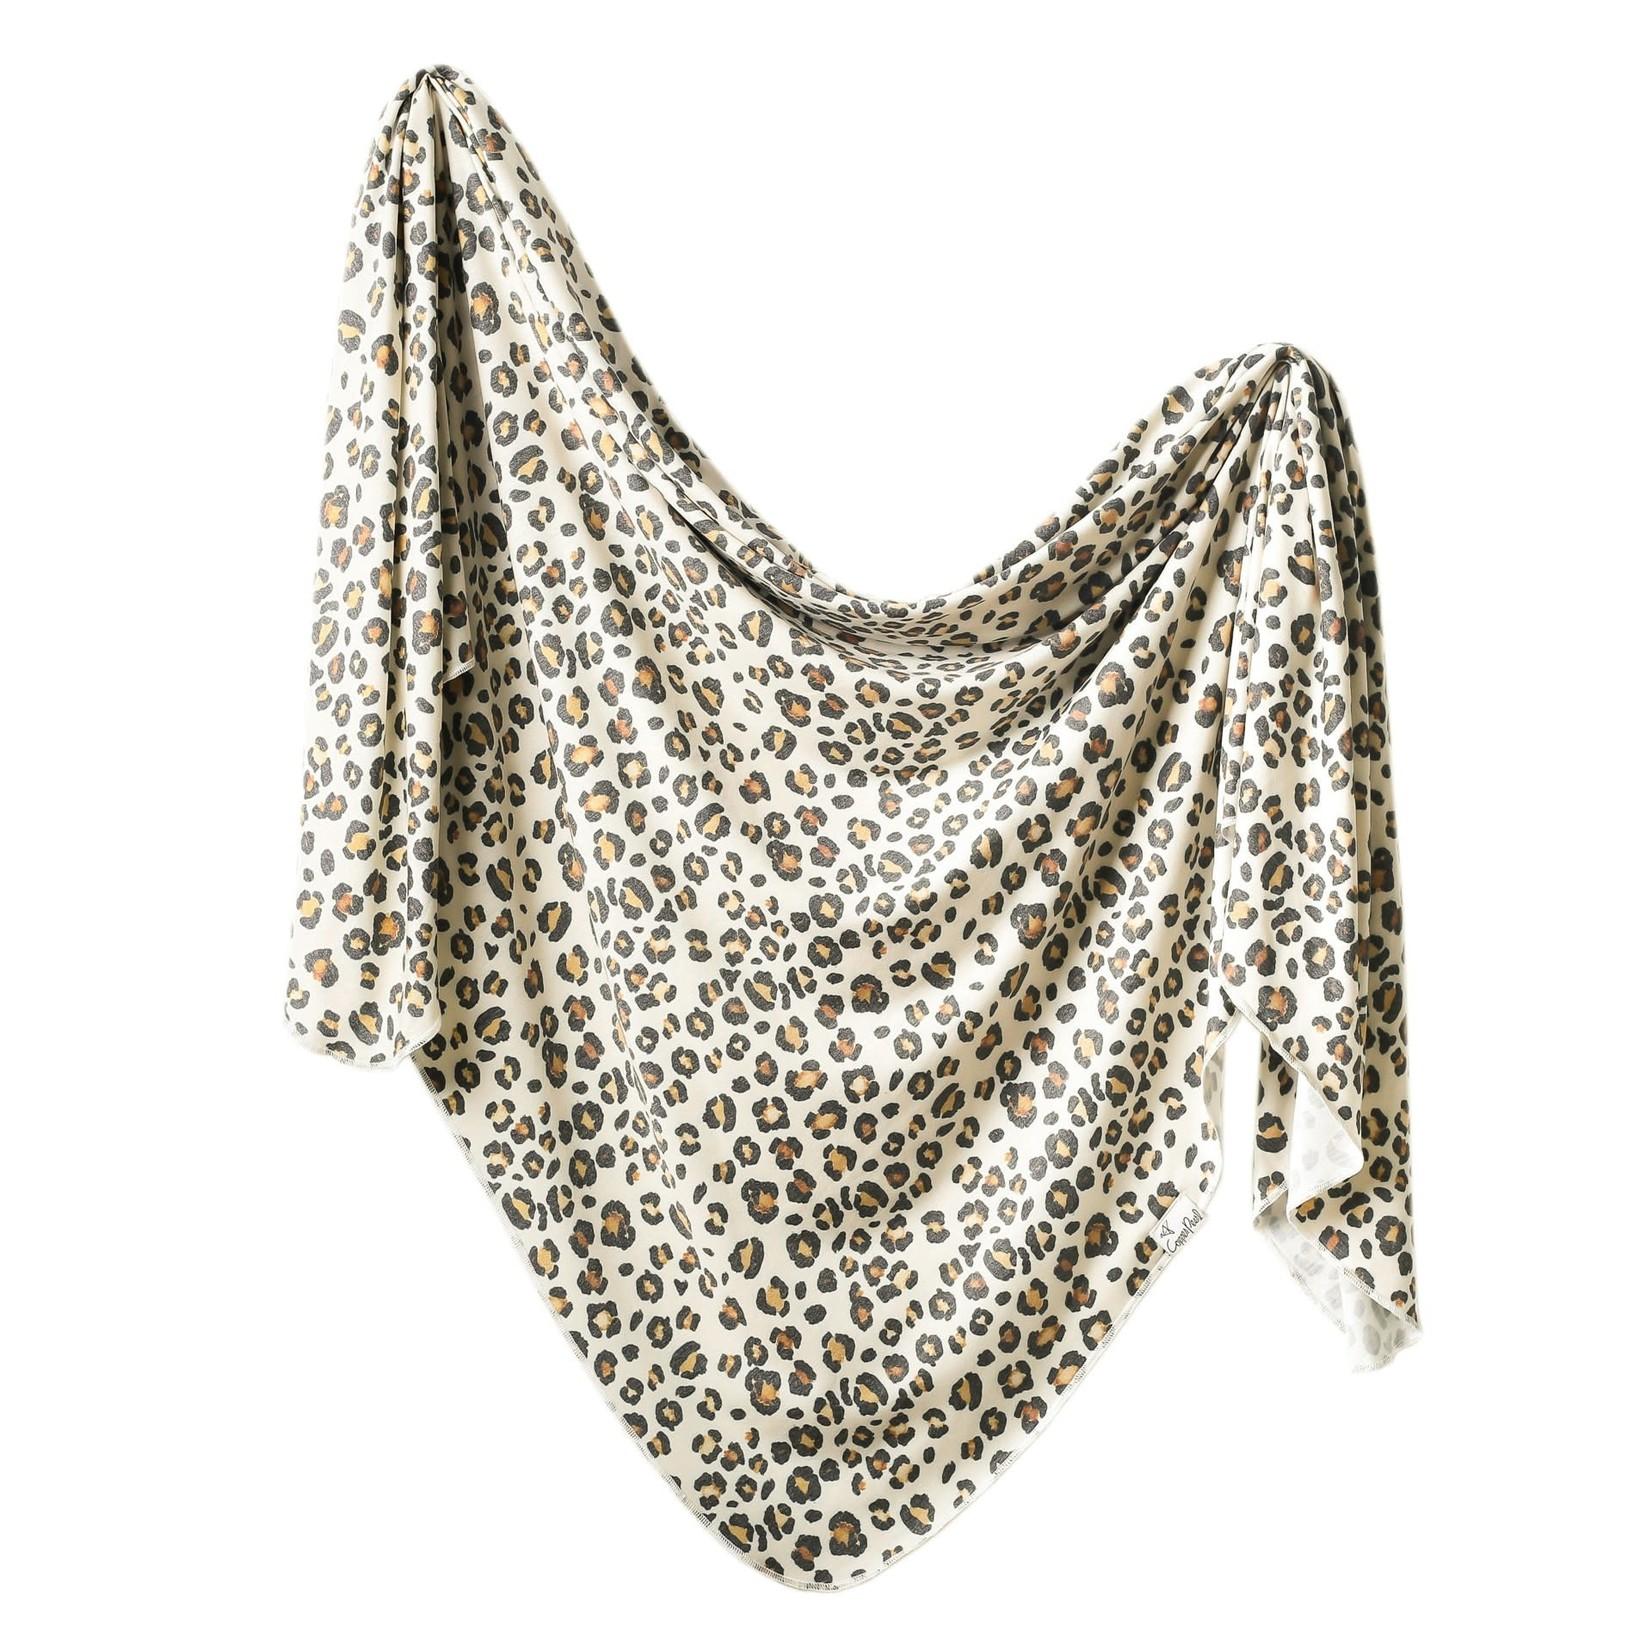 Copper Pearl Knit Blanket - Zara